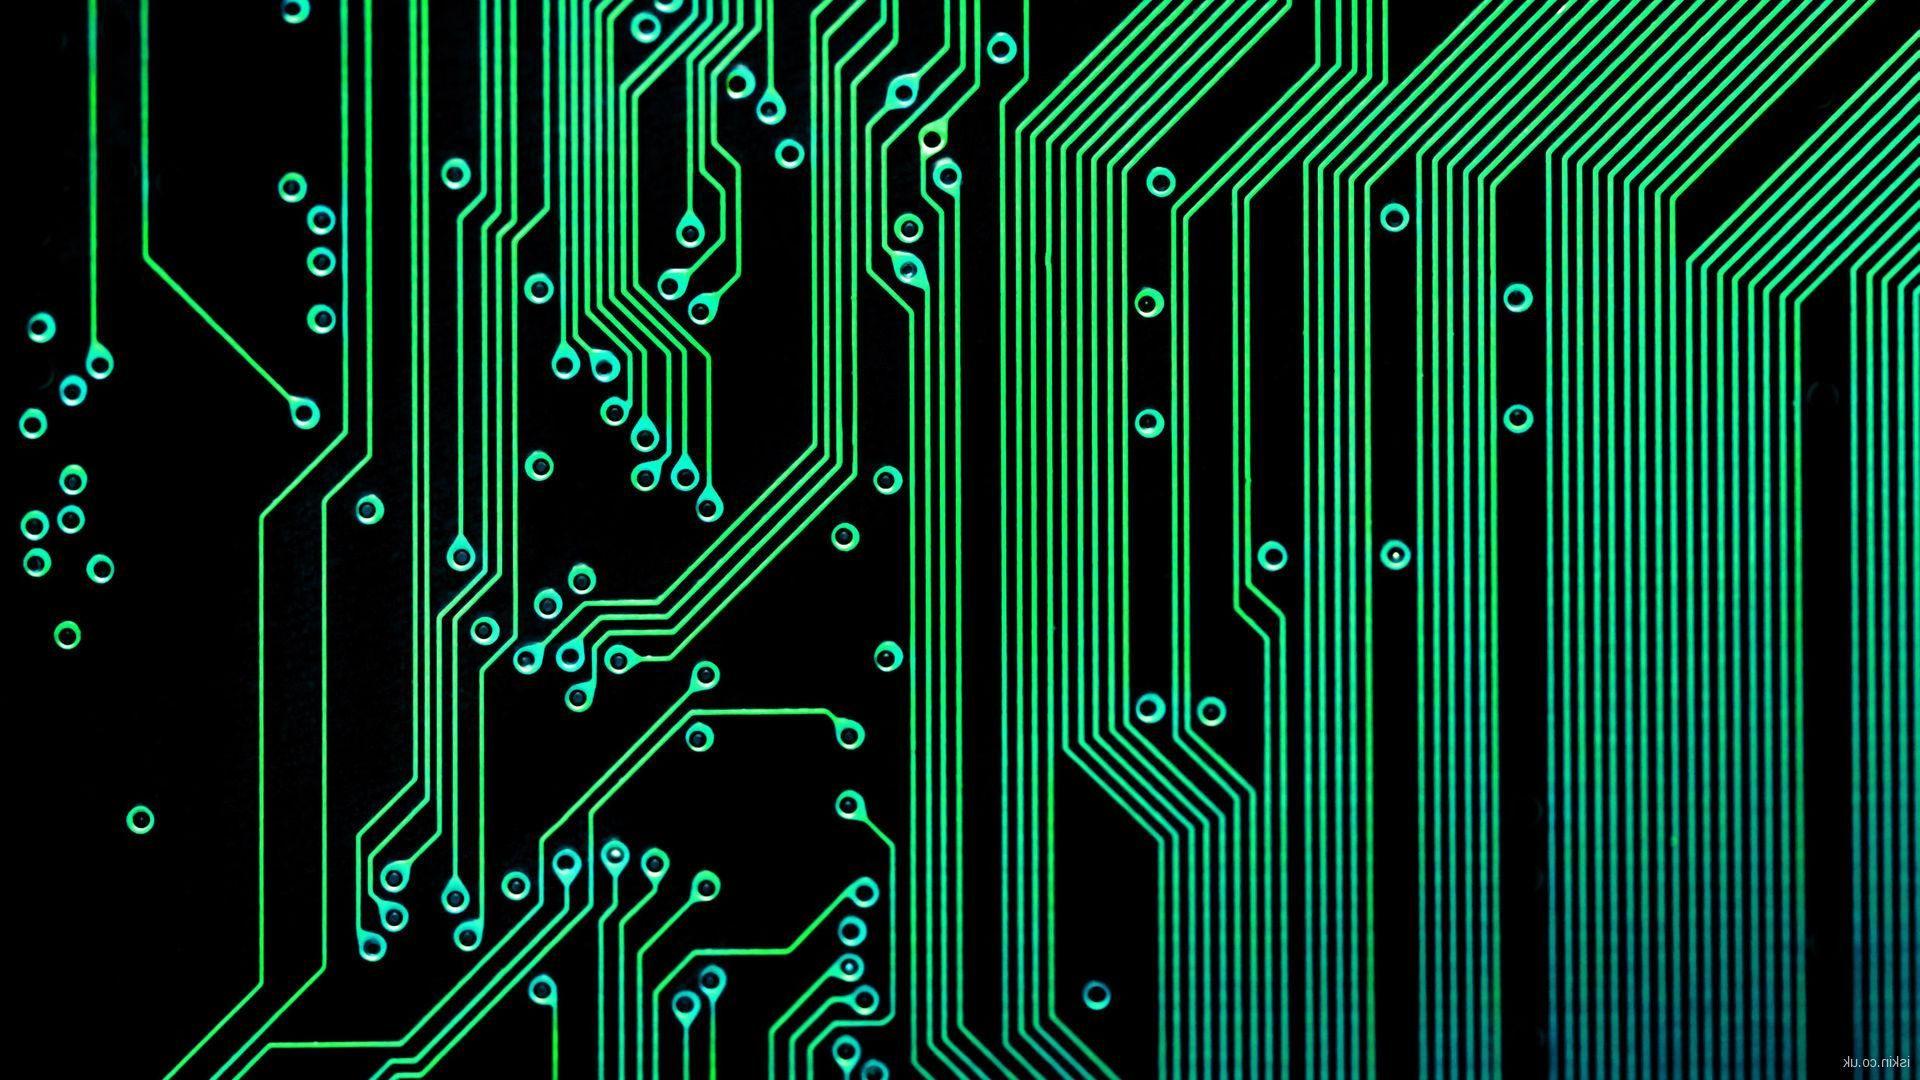 Electronic Circuit wallpaper in 2019 Technology wallpaper 1920x1080